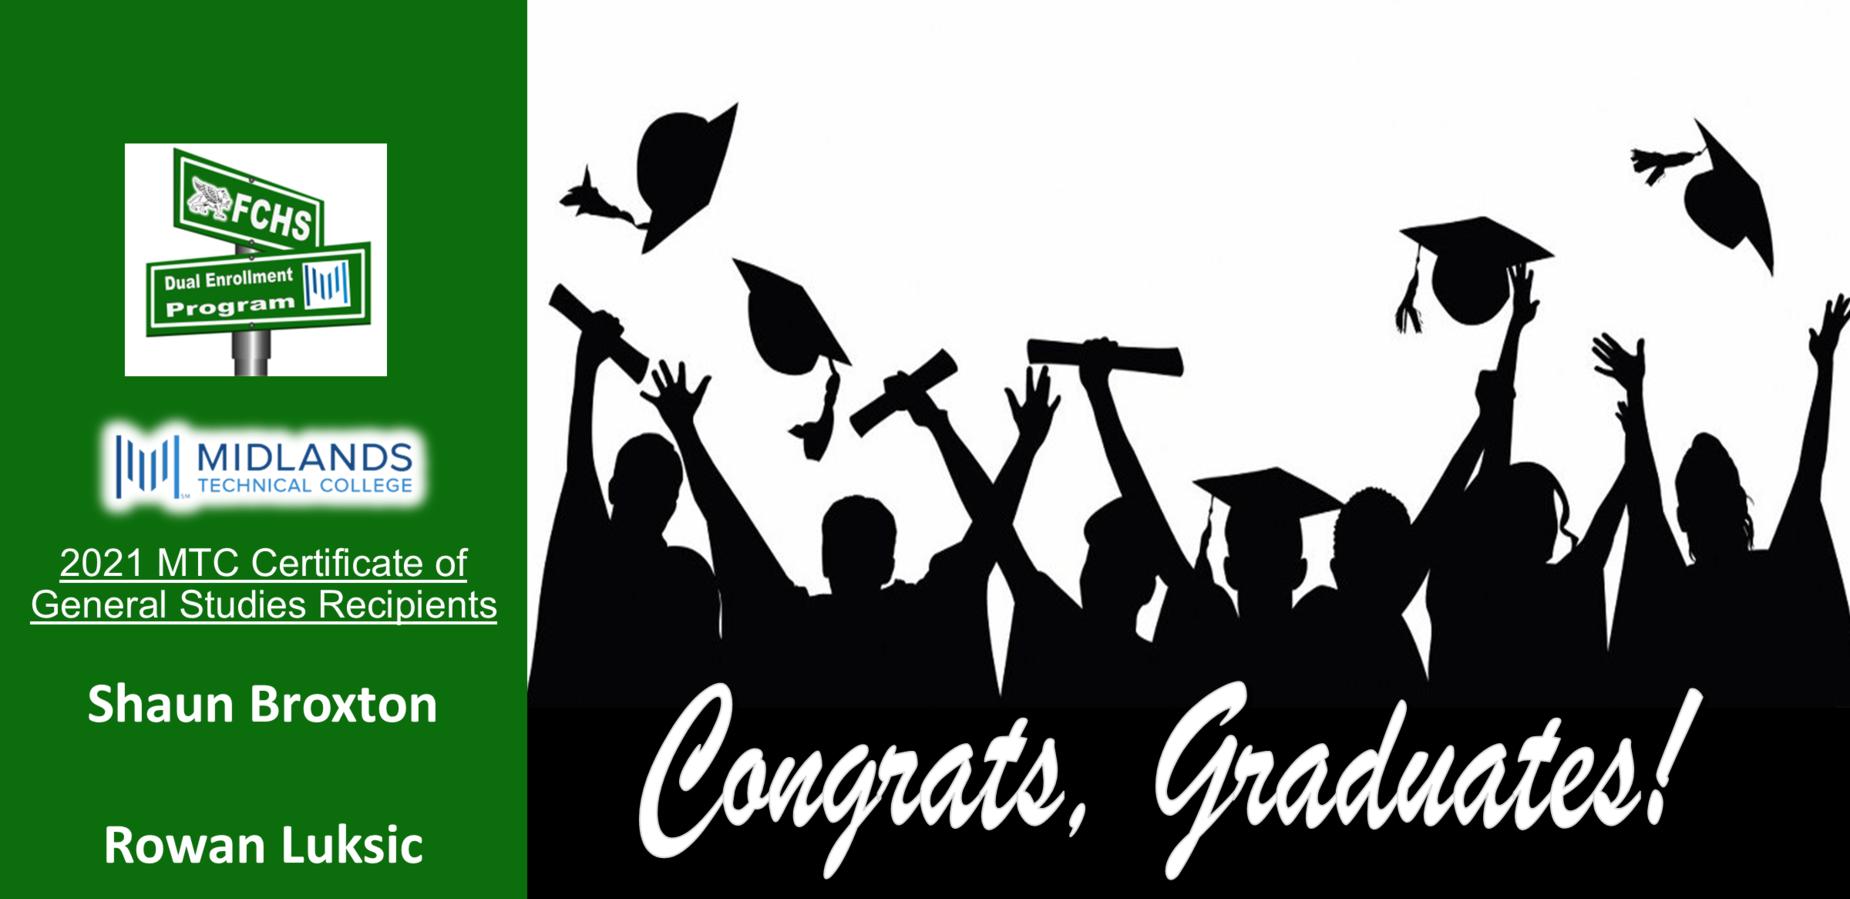 2021 MTC Certificate of General Studies Recipients   Shaun Broxton  Rowan Luksic